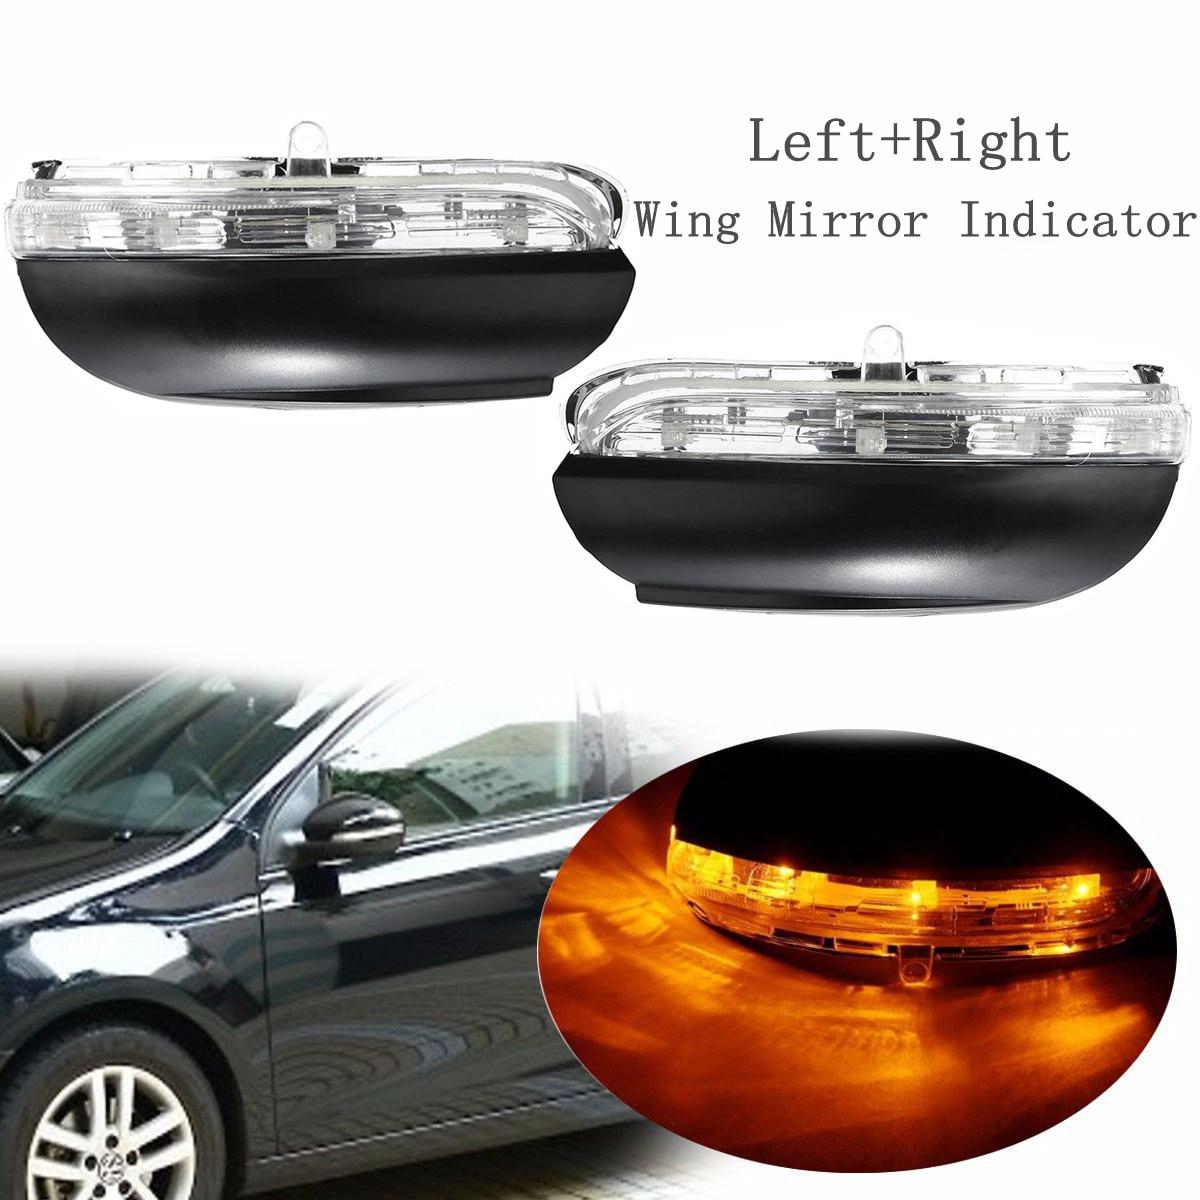 Passenger Near Side Left Wing Mirror Indicator Turn Signal for VW TOURAN 2010+